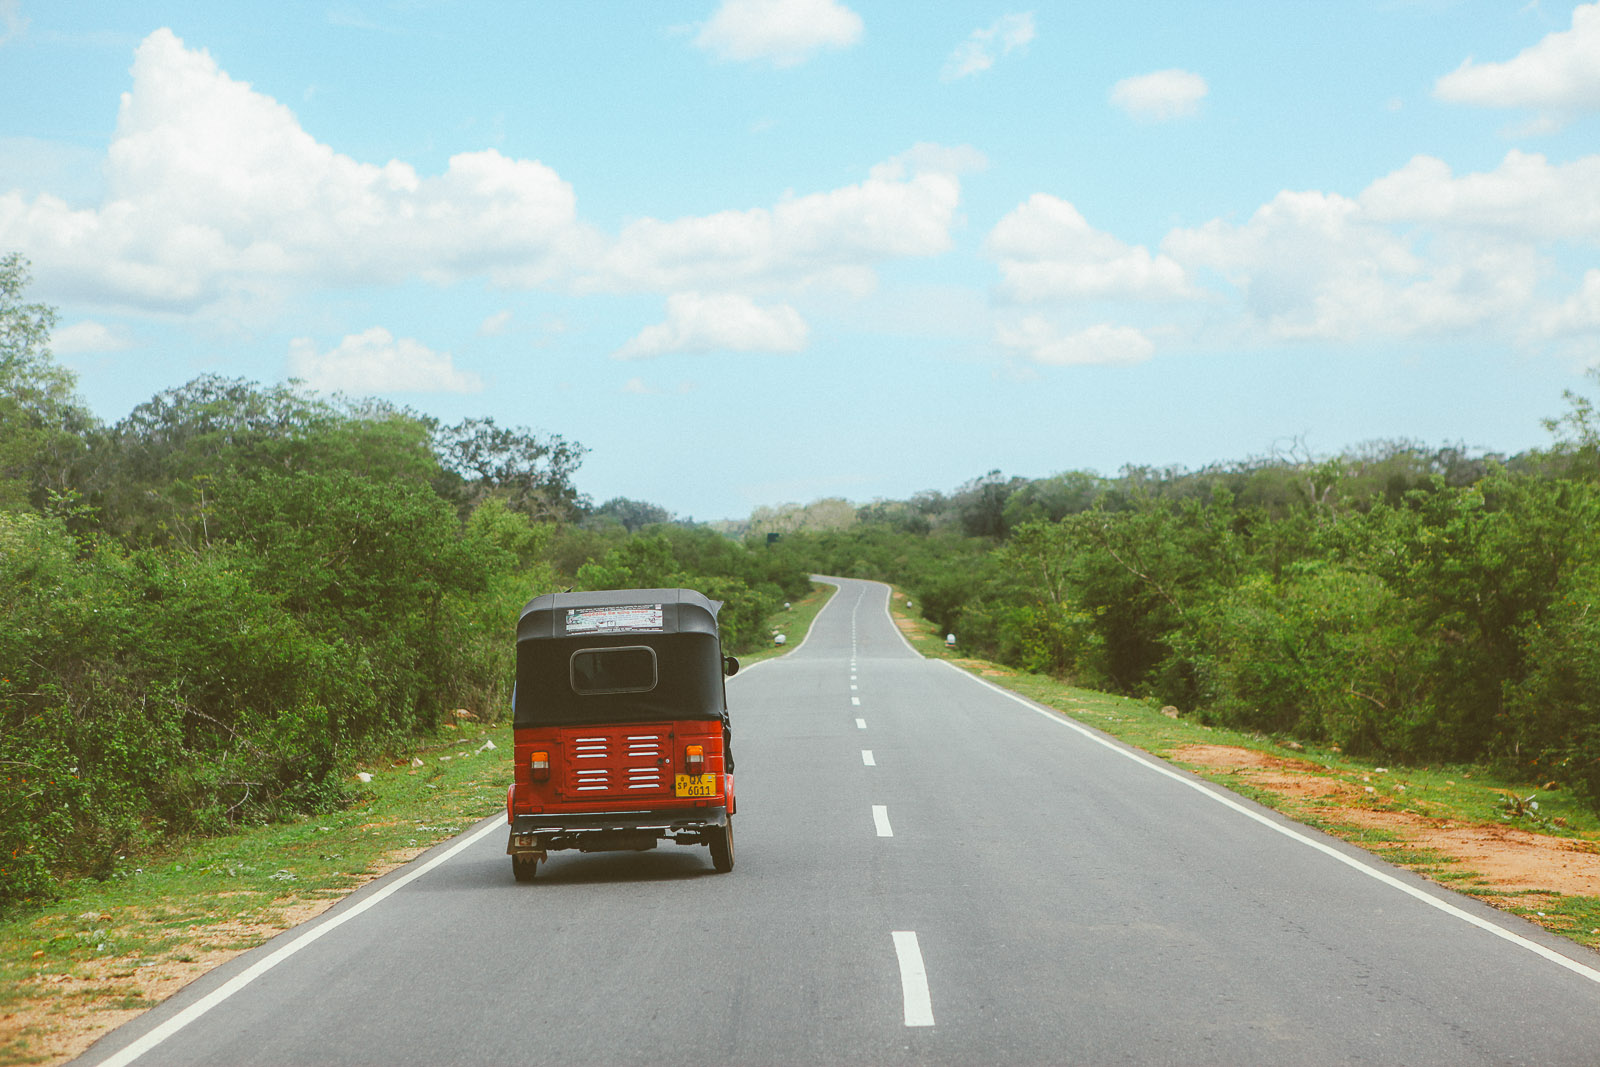 Sri Lanka-Yala-National-Park-Elephant-Wildlife-Safari-Jeep-Roadtrip-IMG_6268